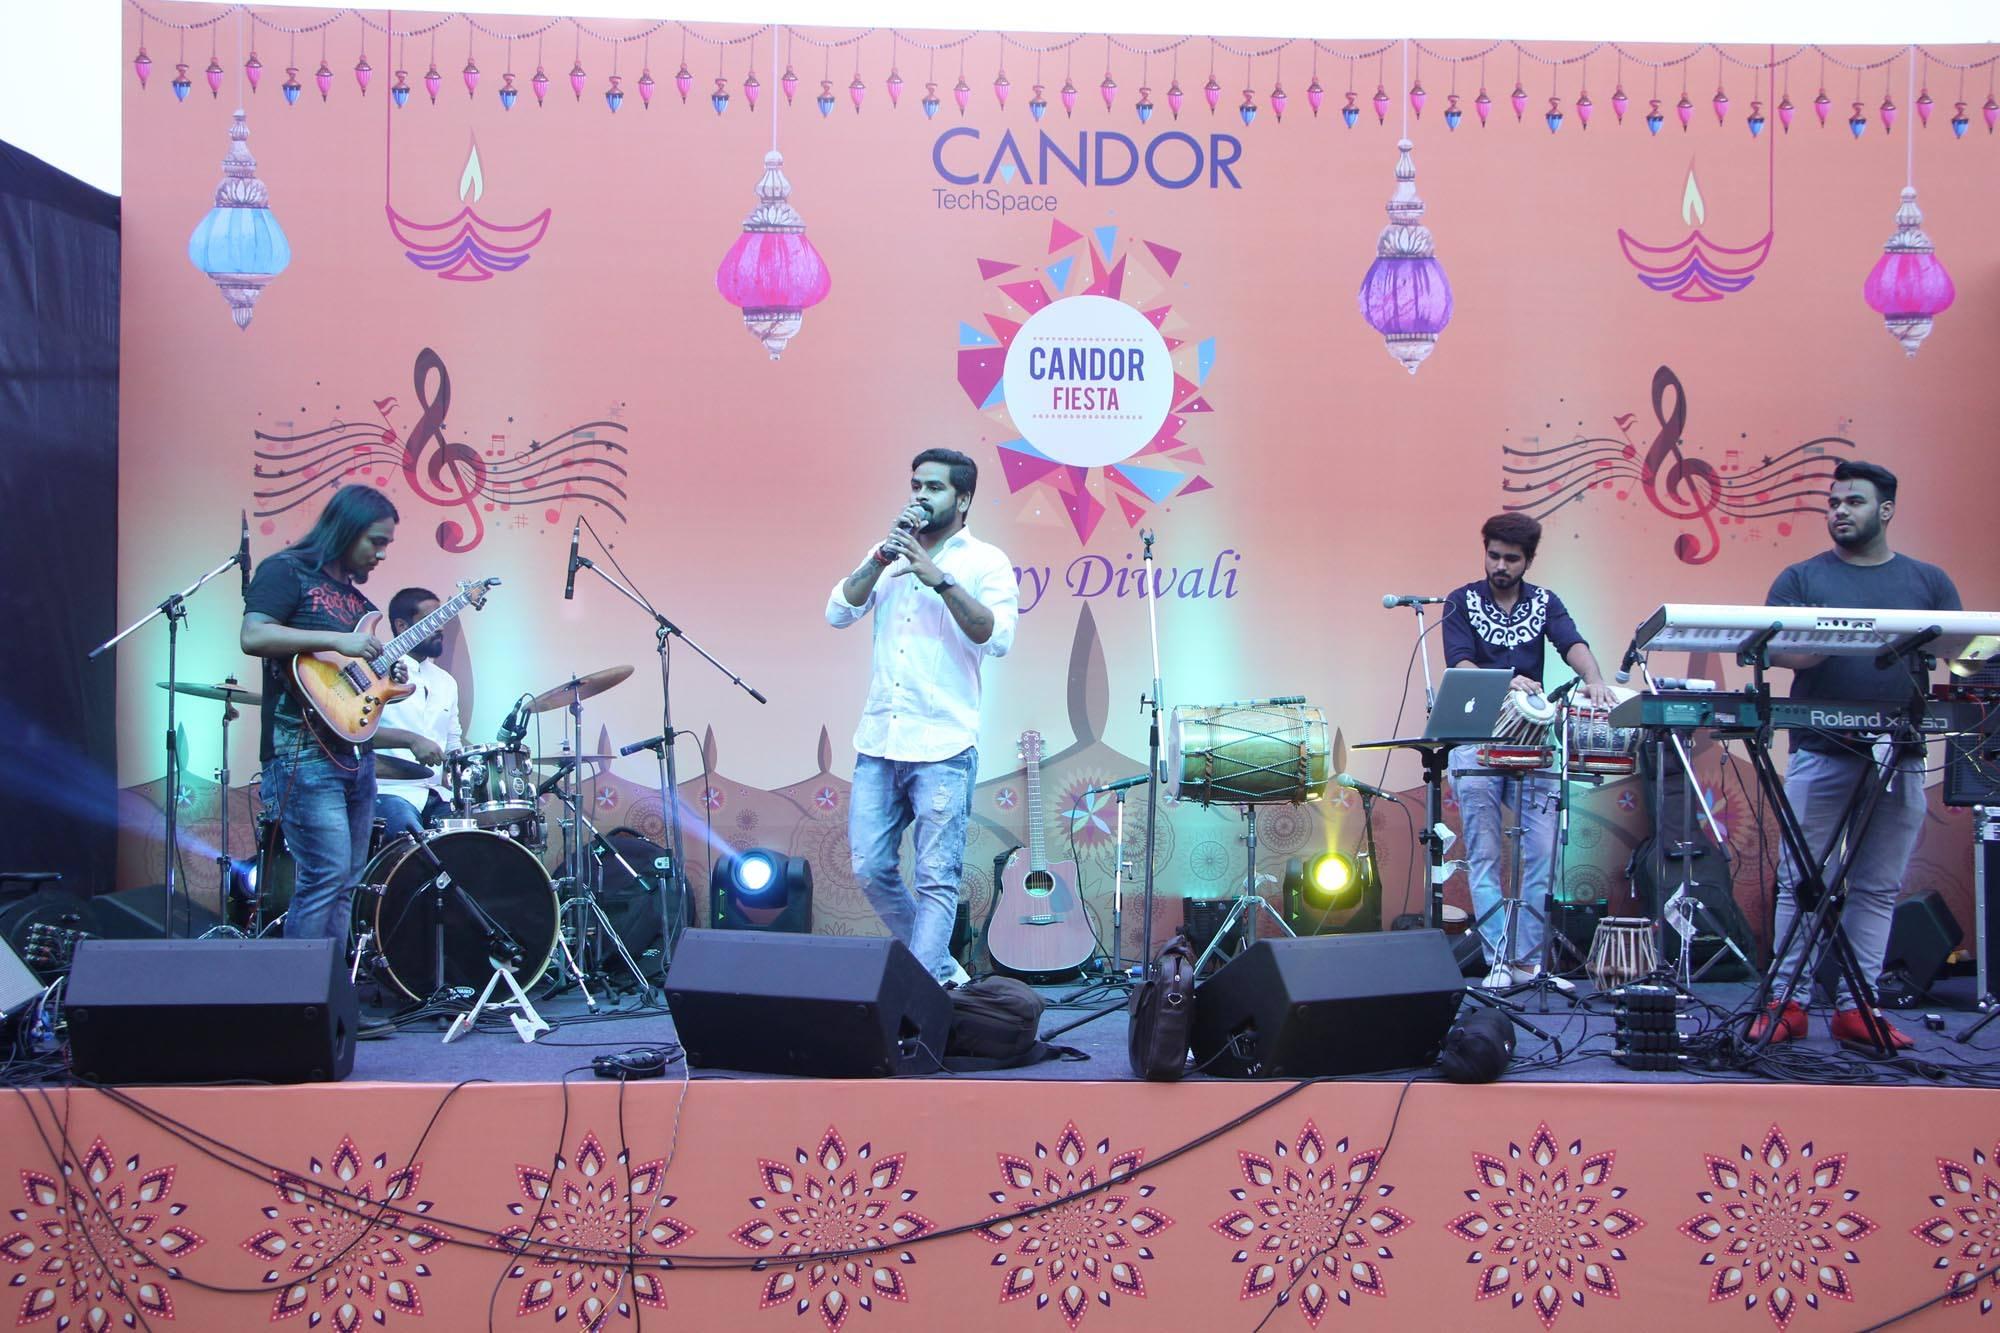 candor-diwali-Noida-62-15.jpg